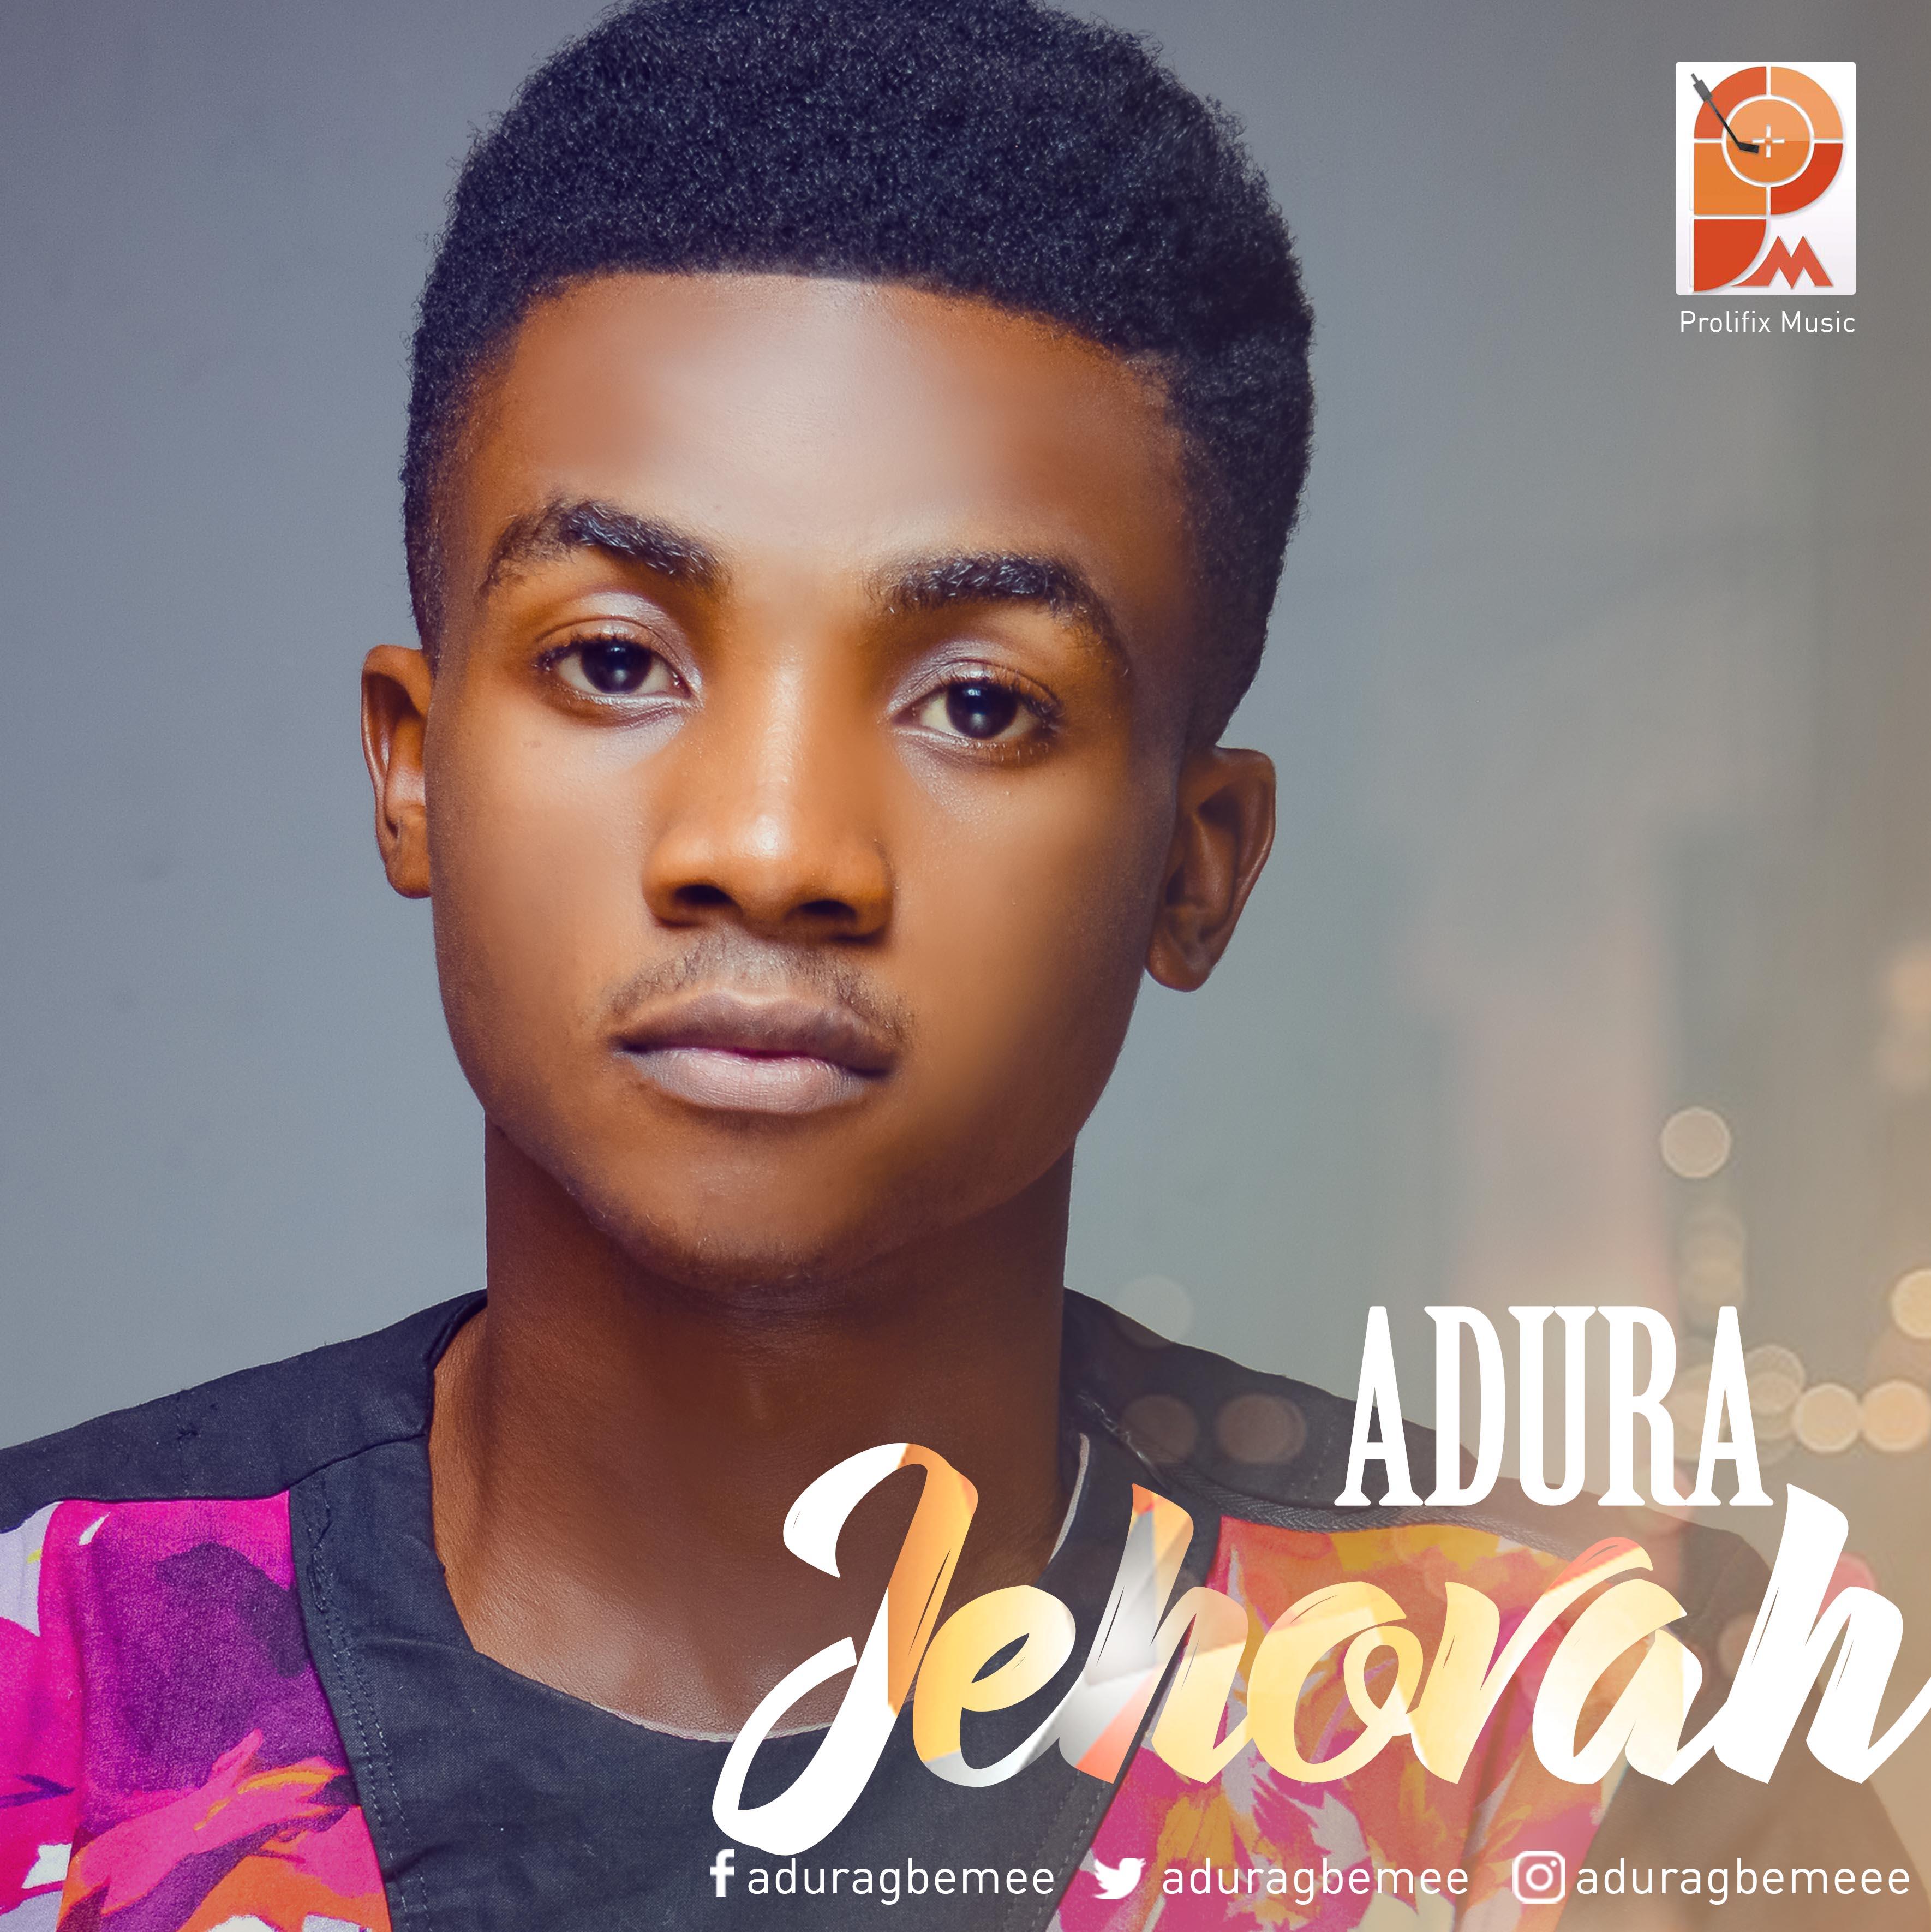 Jehovah - Aduragbemee